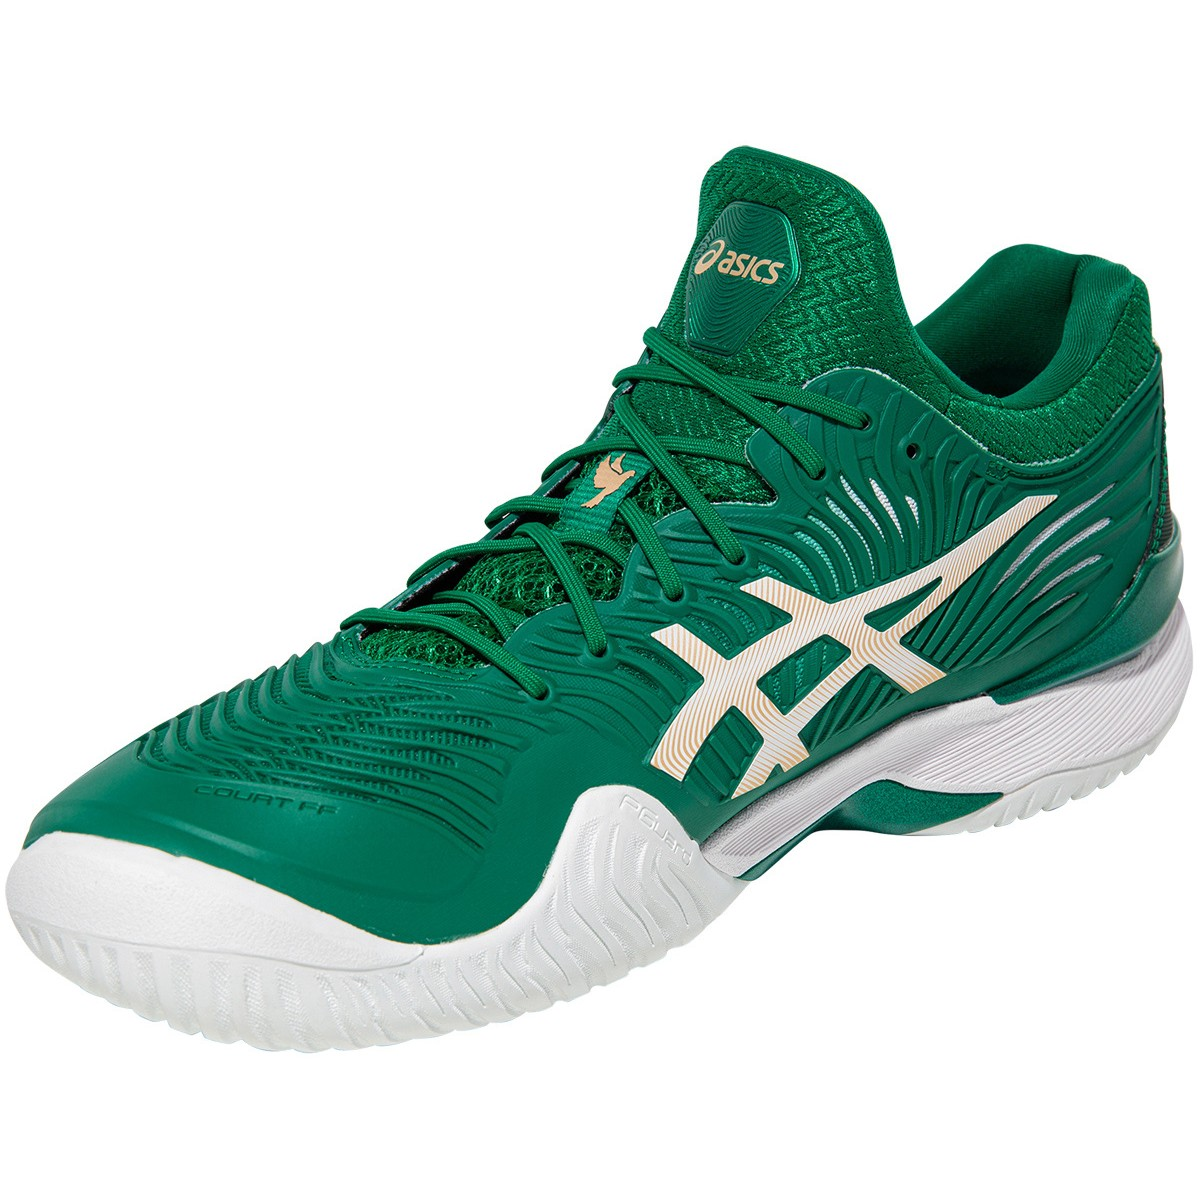 Asics Court Ff Novak Djokovic All Court Shoes Asics Men S Shoes Tennispro